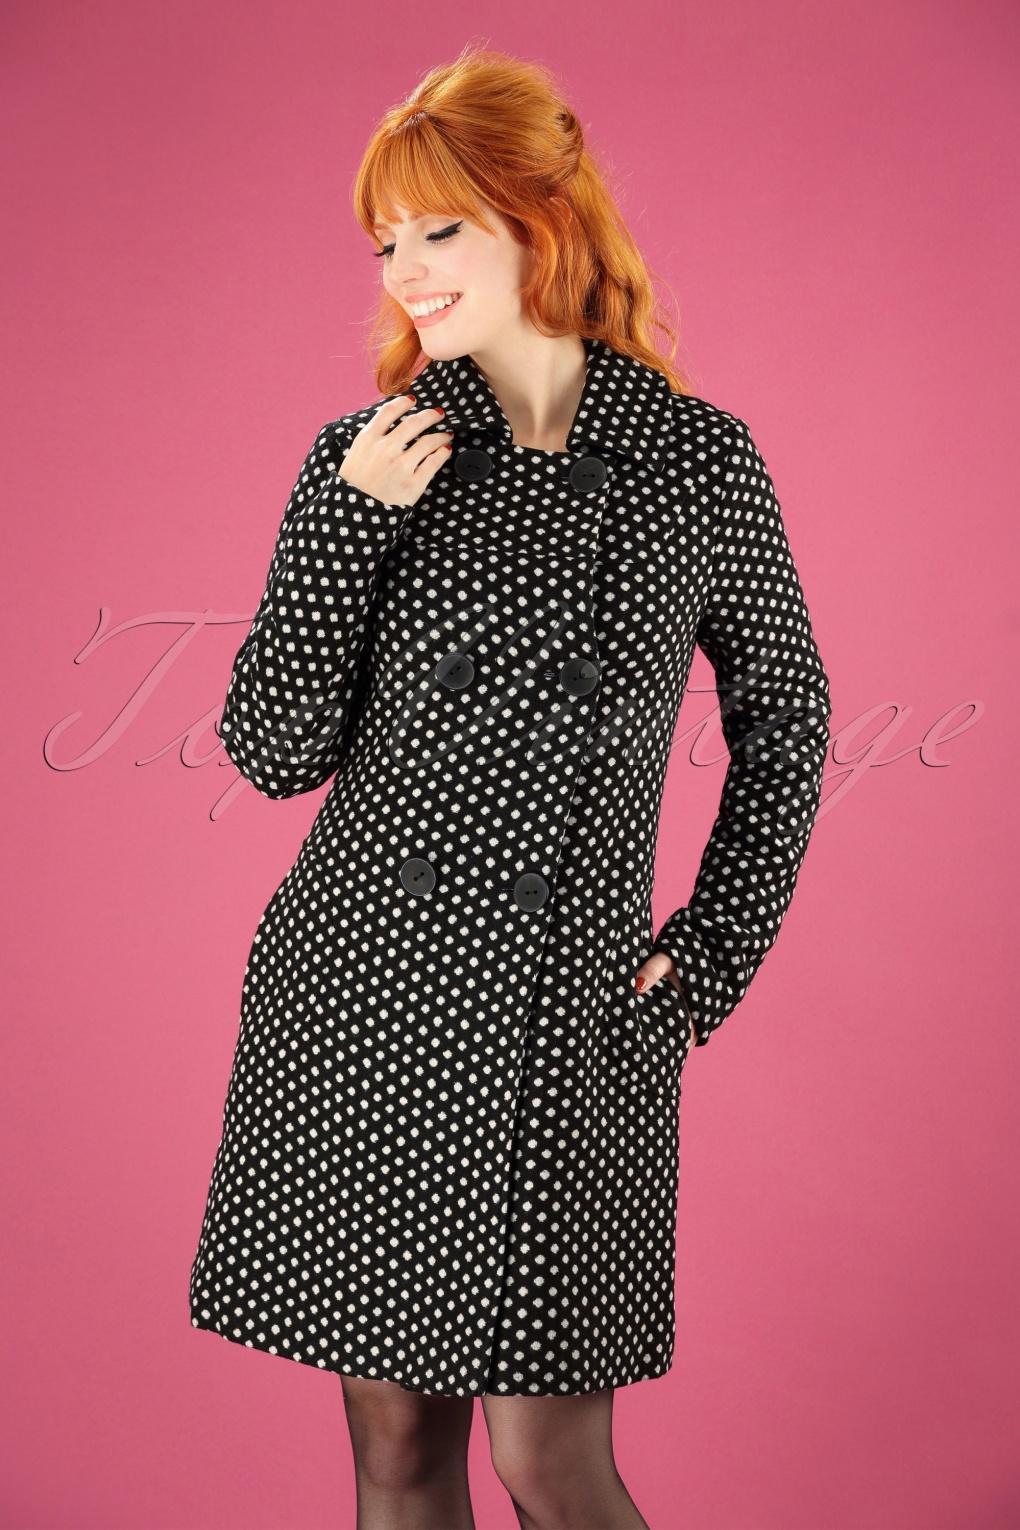 Vintage Coats & Jackets | Retro Coats and Jackets 60s Nora Polkadot Coat in Black £151.37 AT vintagedancer.com